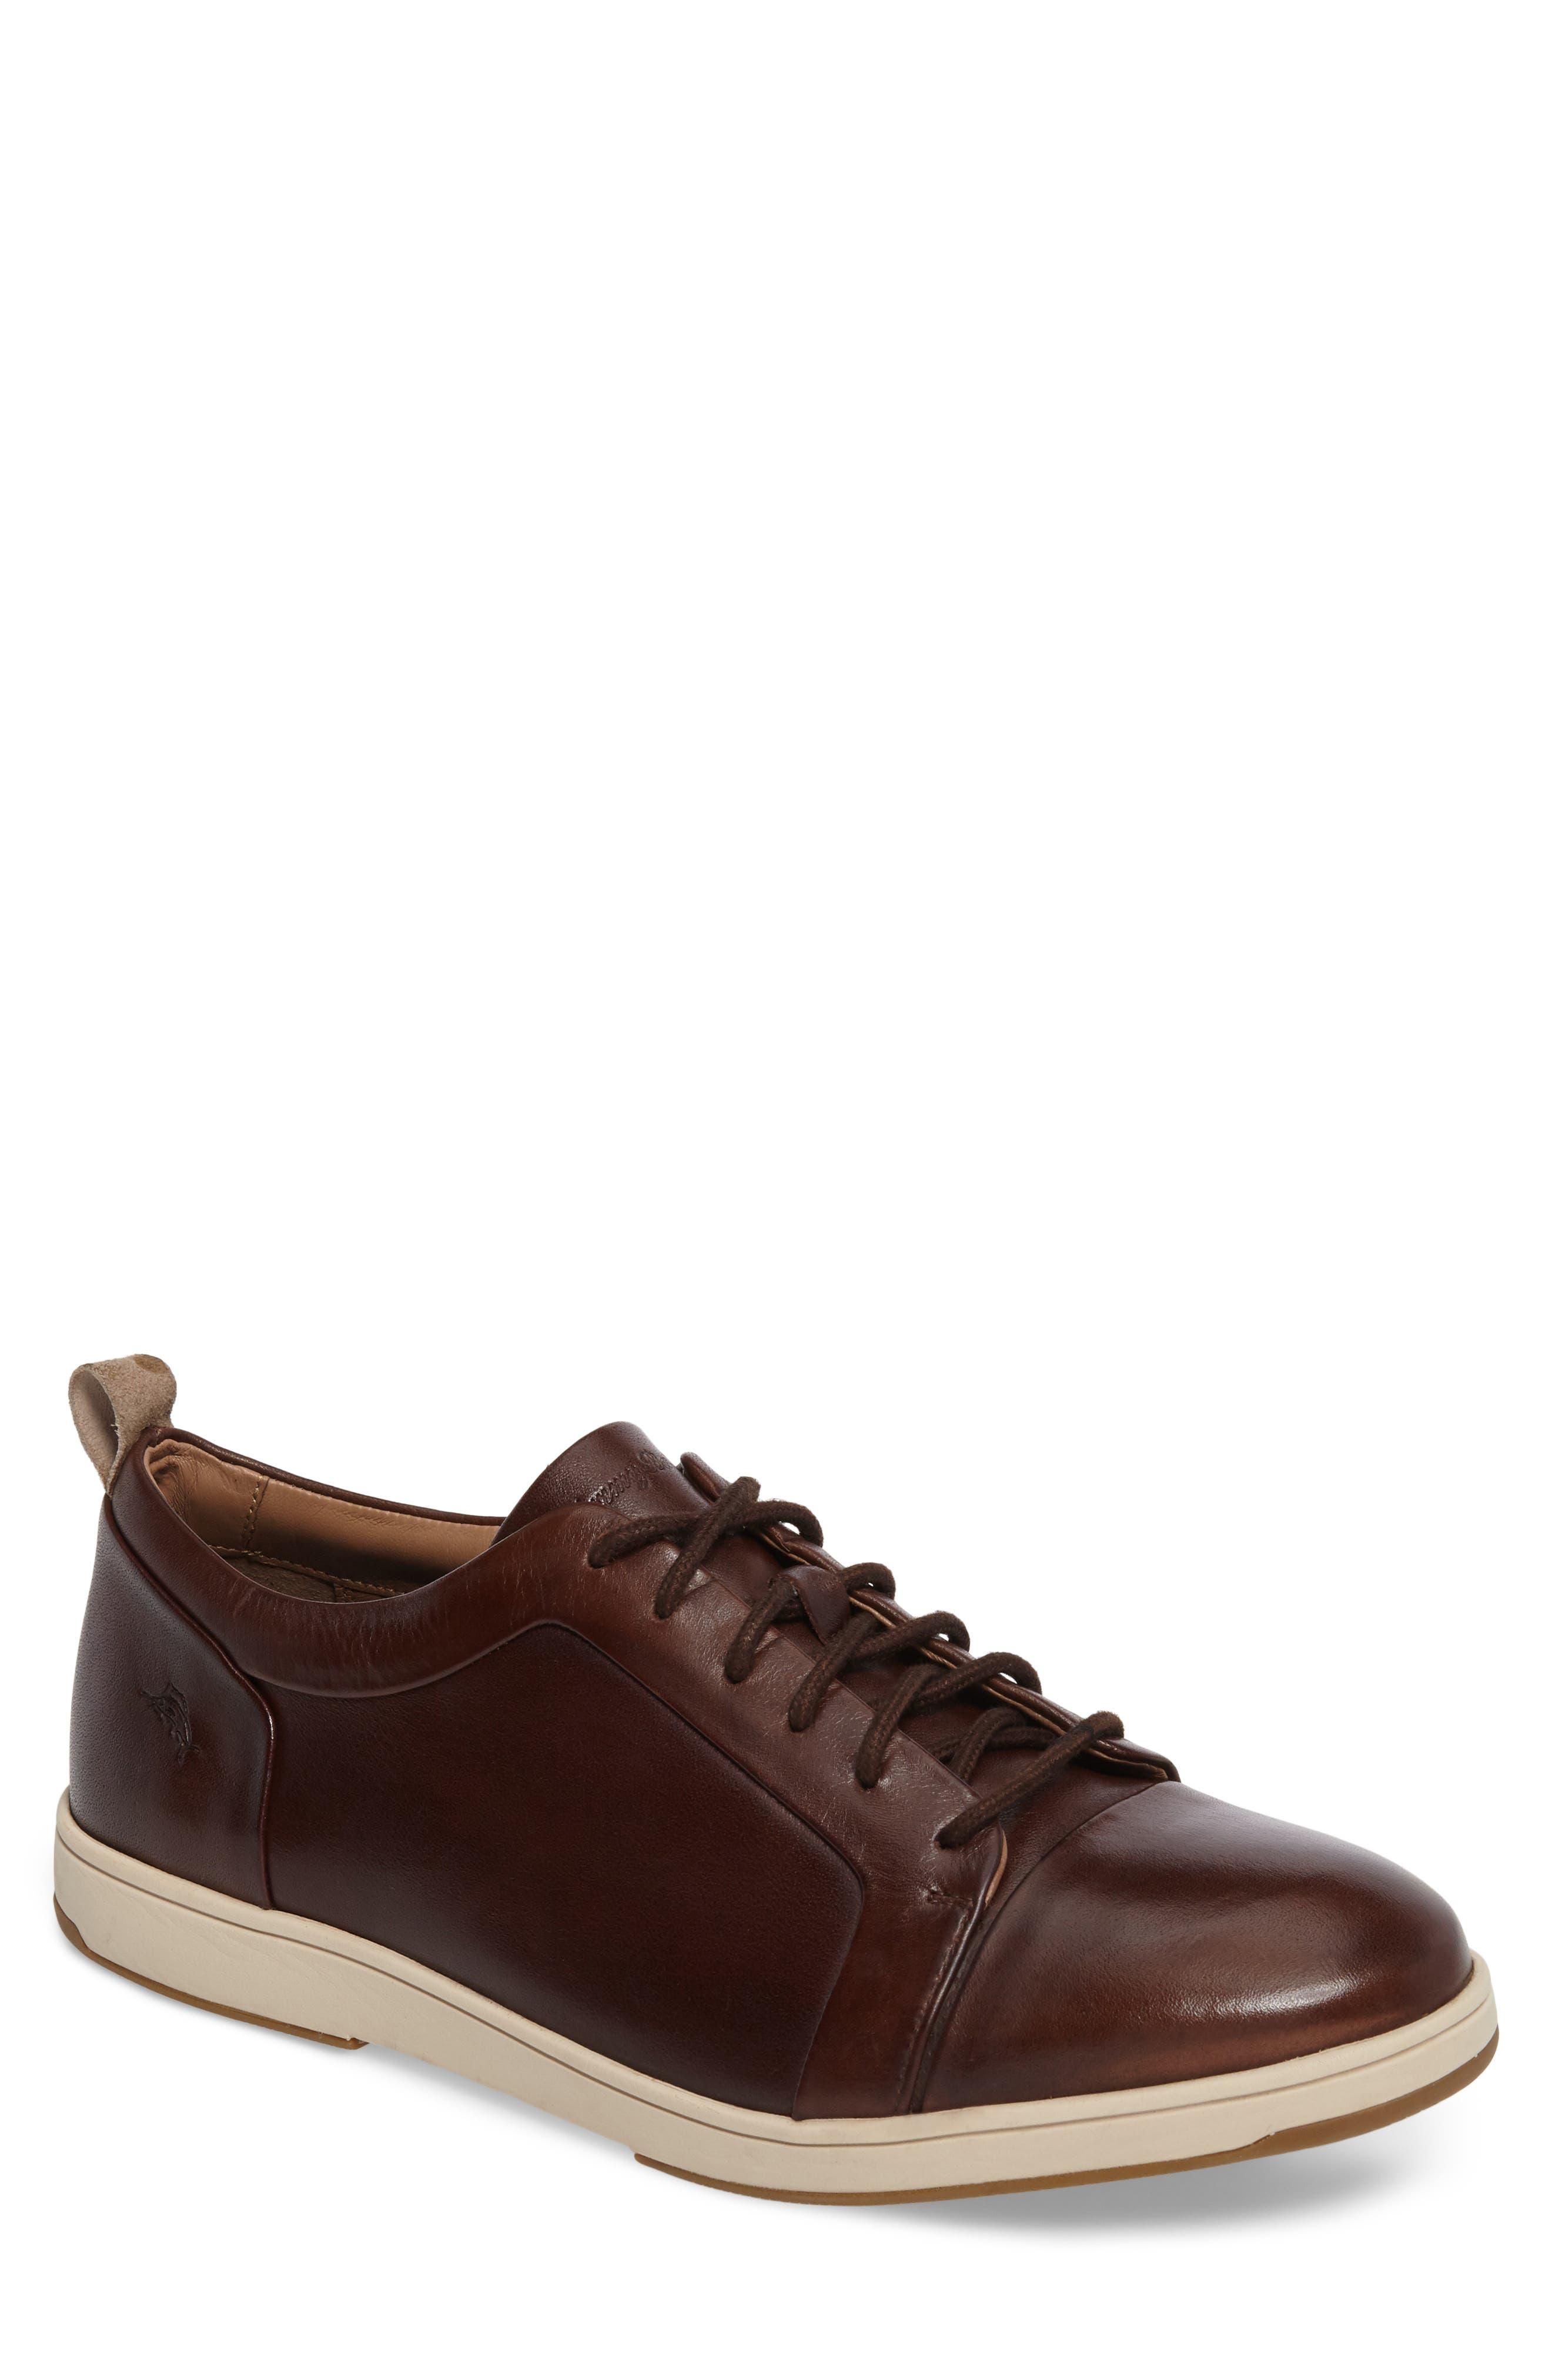 Alternate Image 1 Selected - Tommy Bahama Cadiz Sneaker (Men)